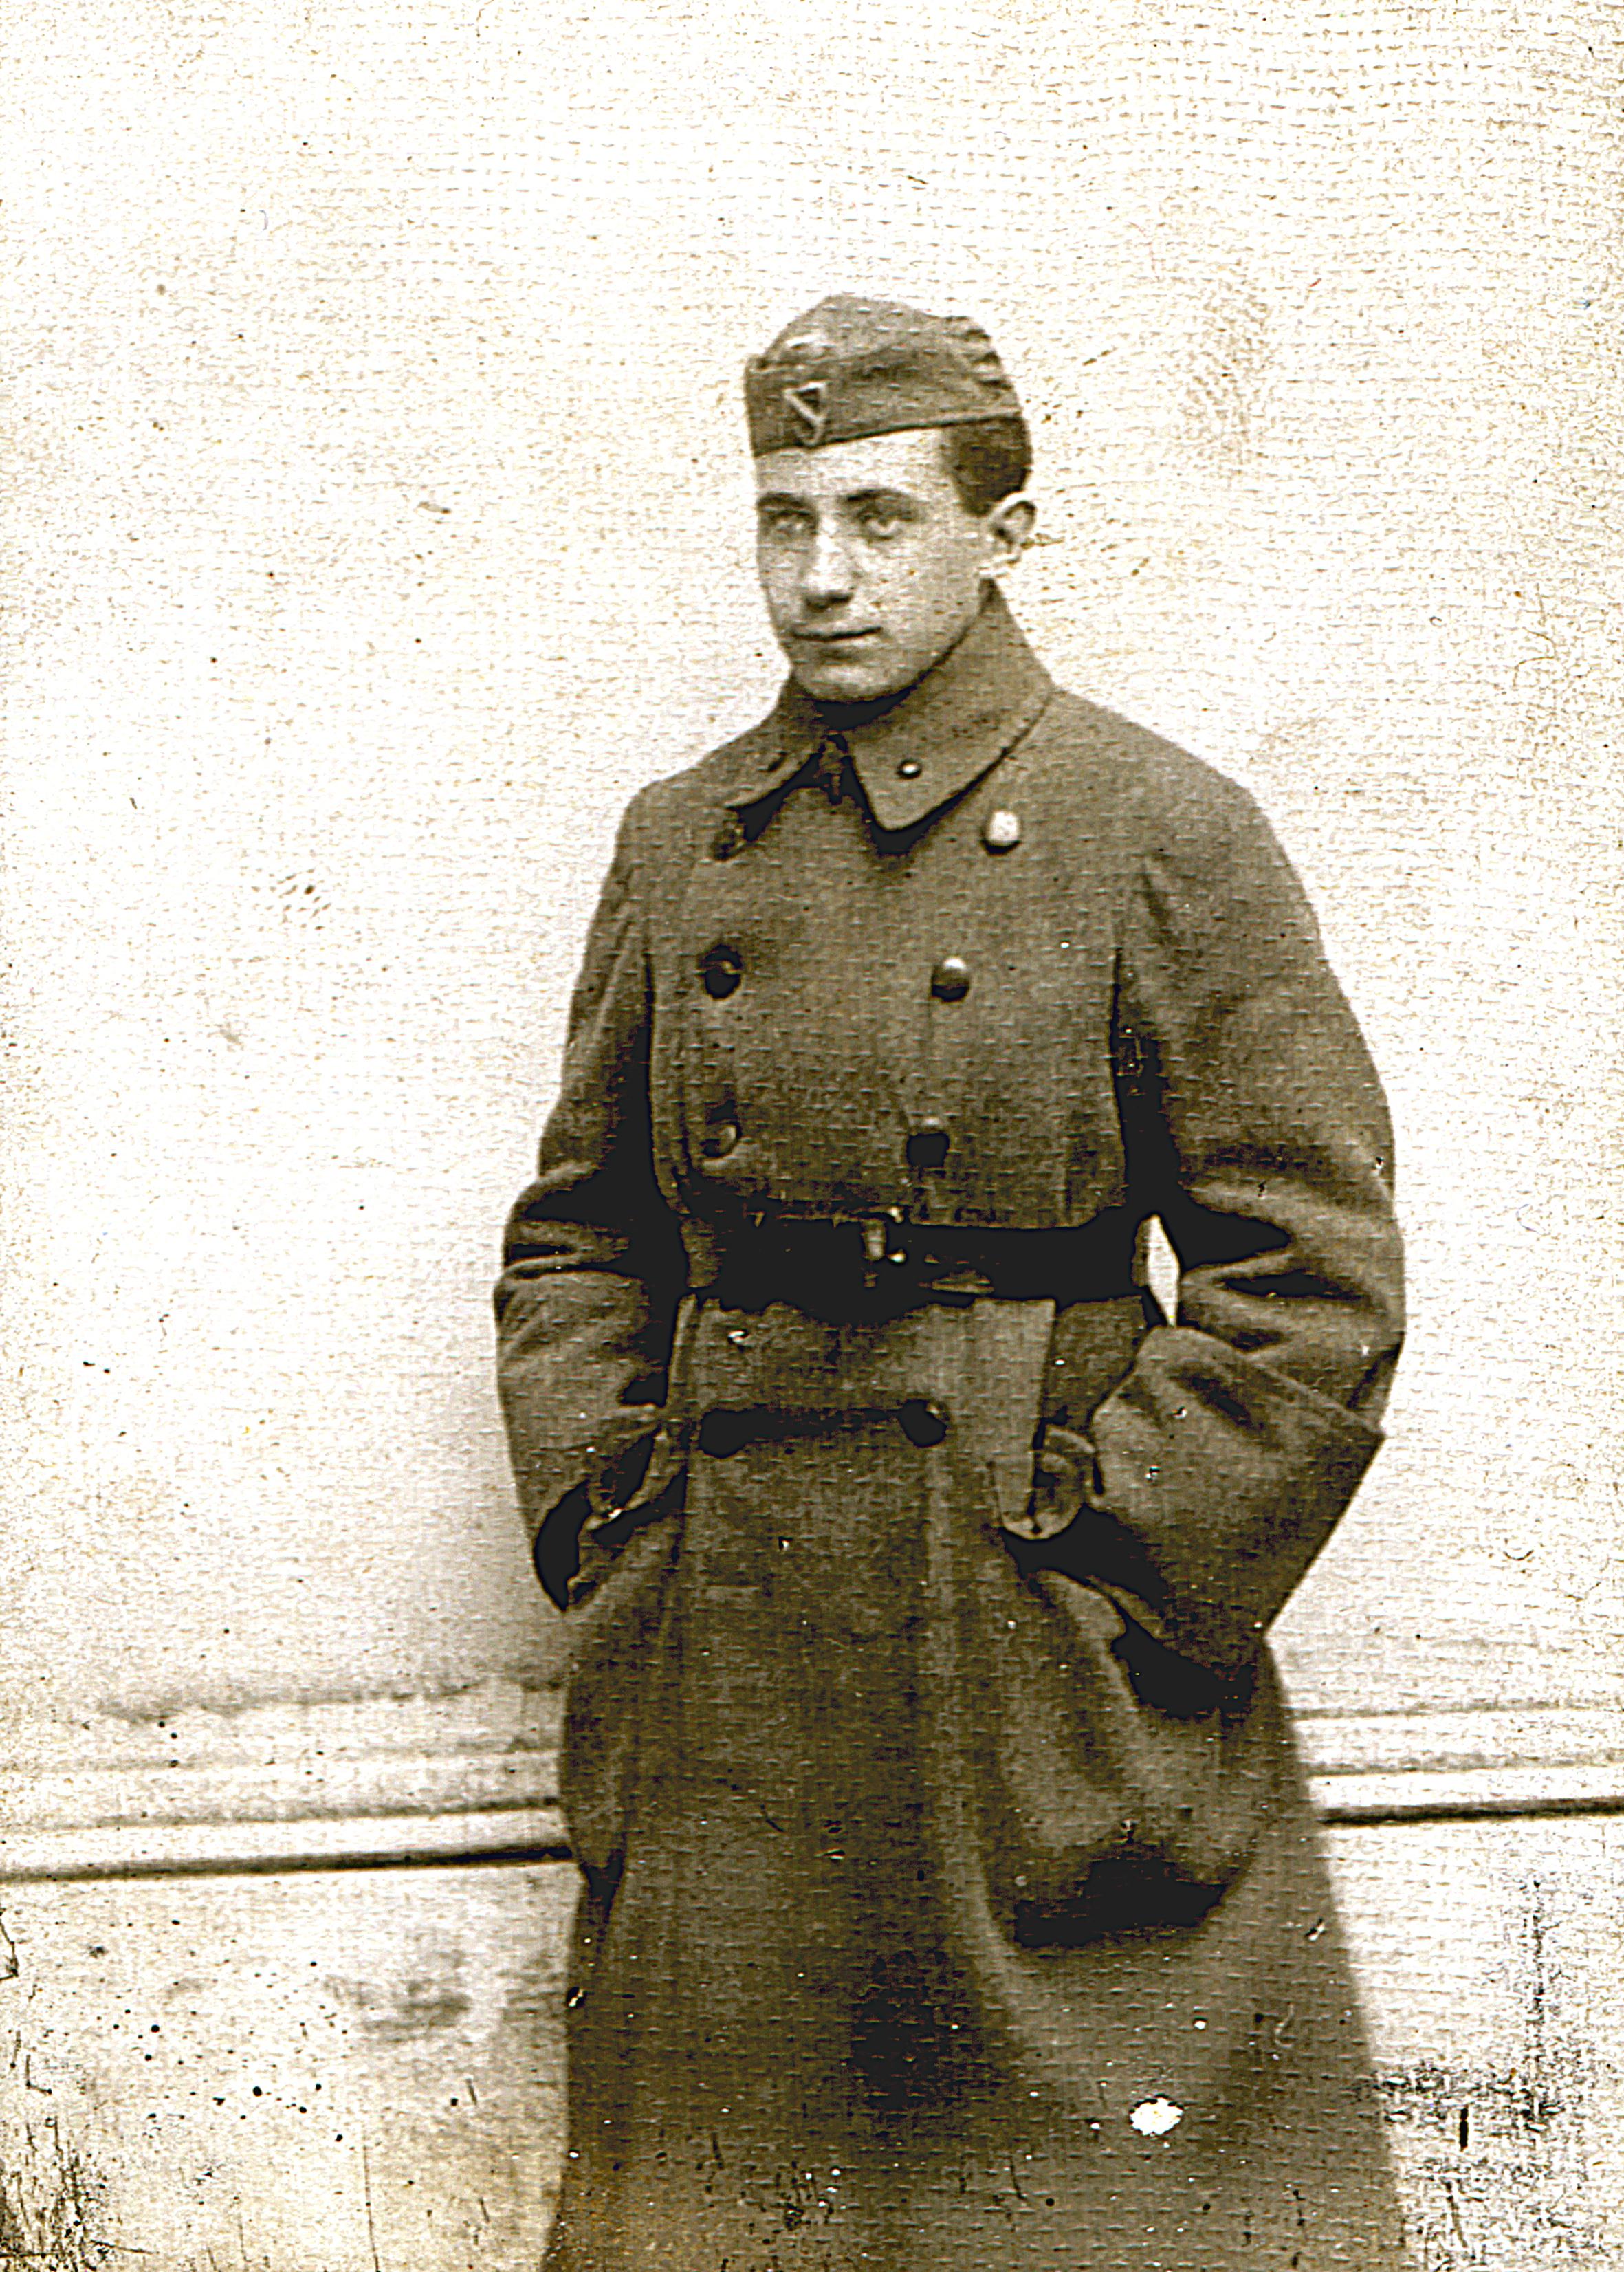 Imre Hamos